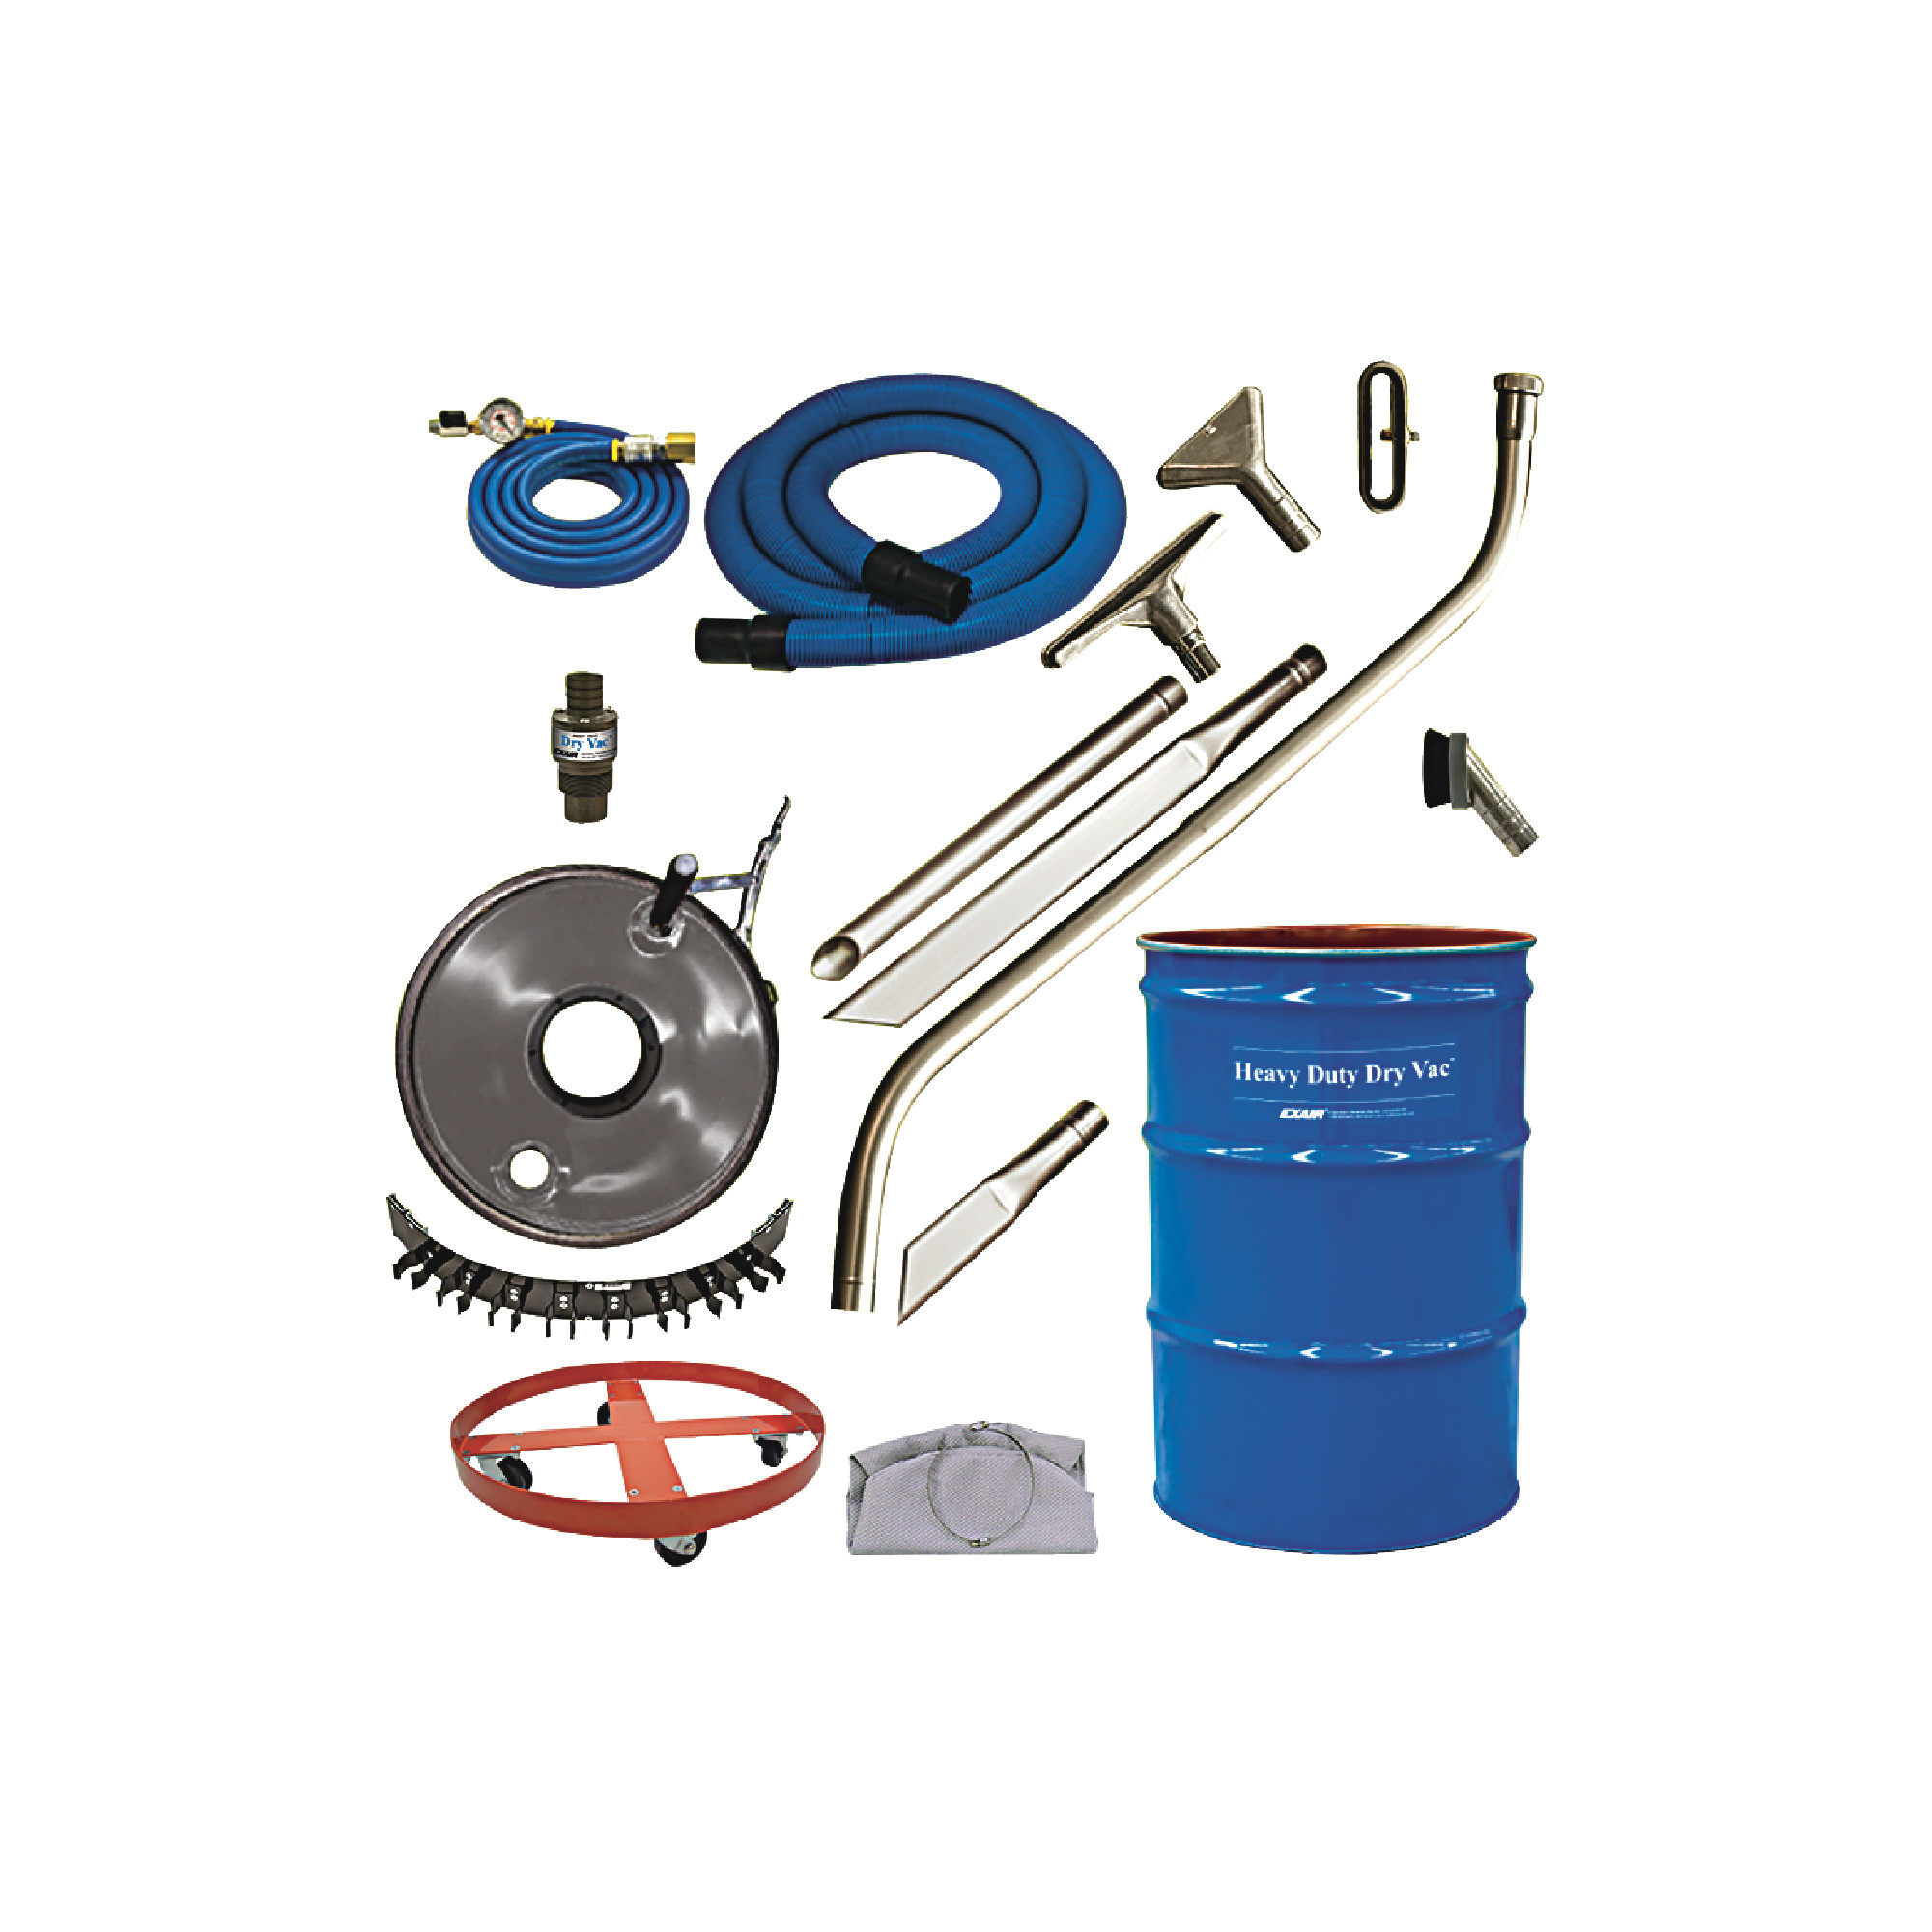 EXAIR 55 Gallon Premium Heavy Duty Dry Vac System  - Model #:  6397